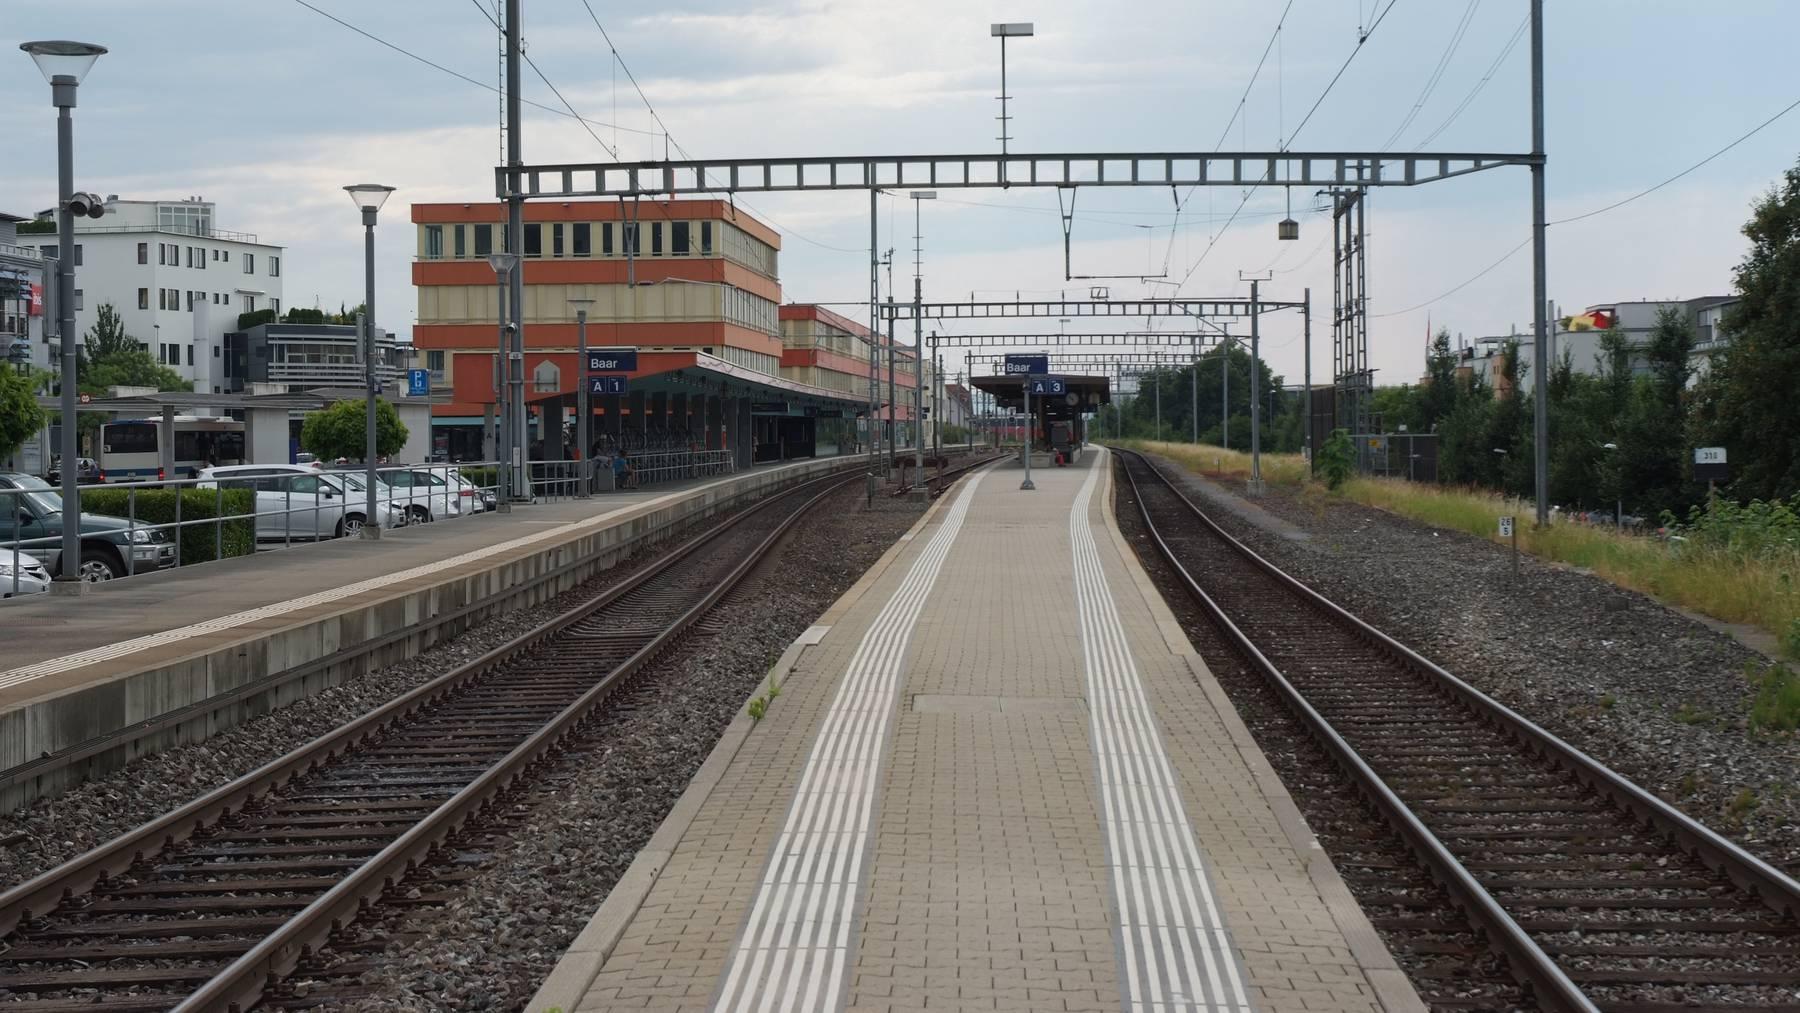 Bahnhof_Baar_Bahnsteig_1